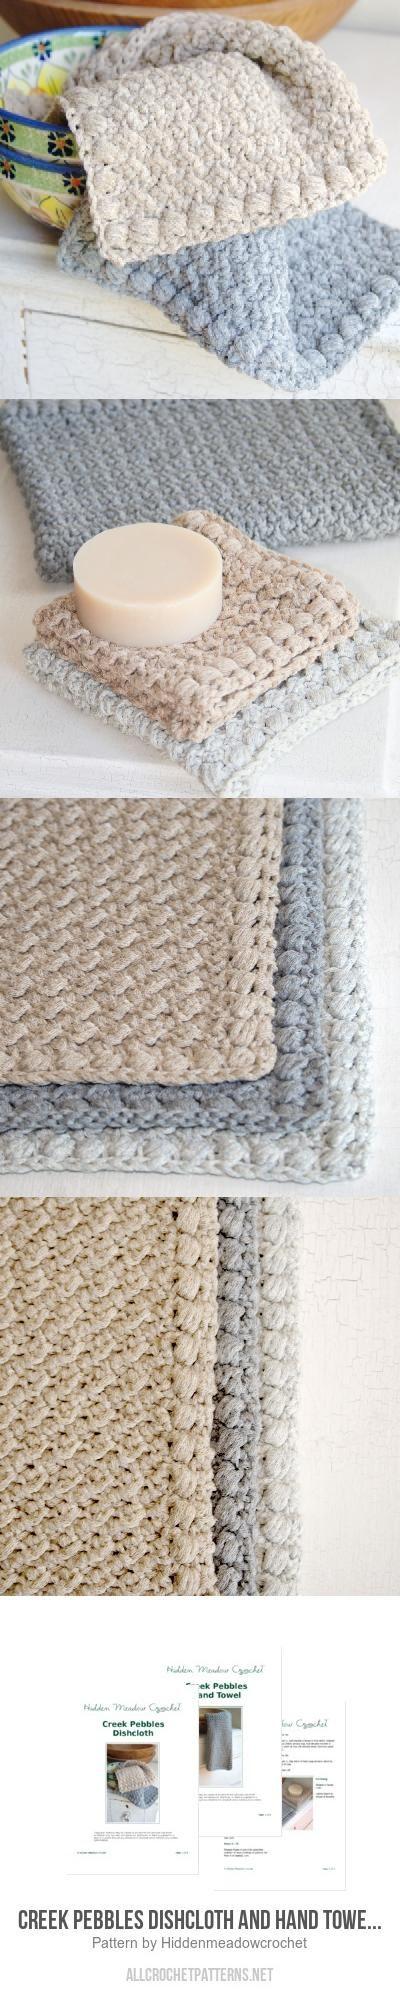 Creek Pebbles Dishcloth and Hand Towel Set crochet pattern by Hidden ...